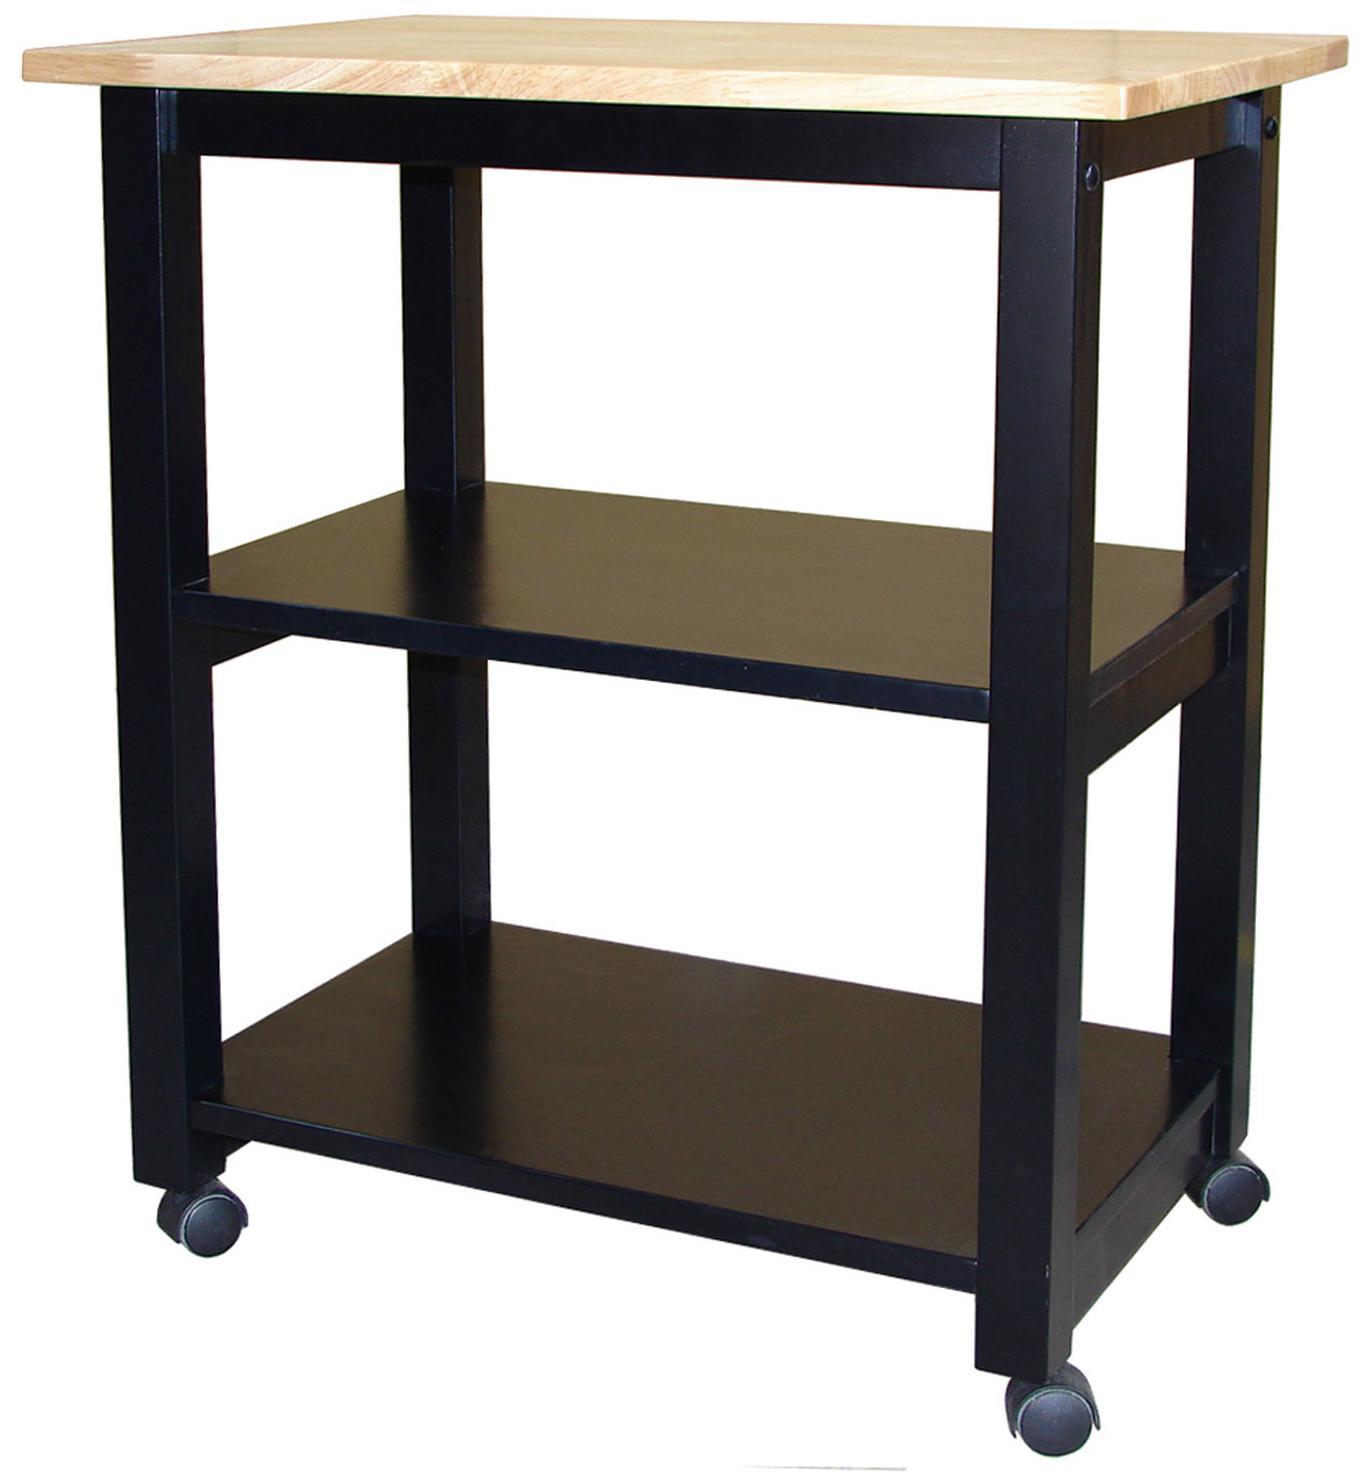 John Thomas Dining Essentials 2-Shelf Kitchen Cart - Item Number: WC10-185